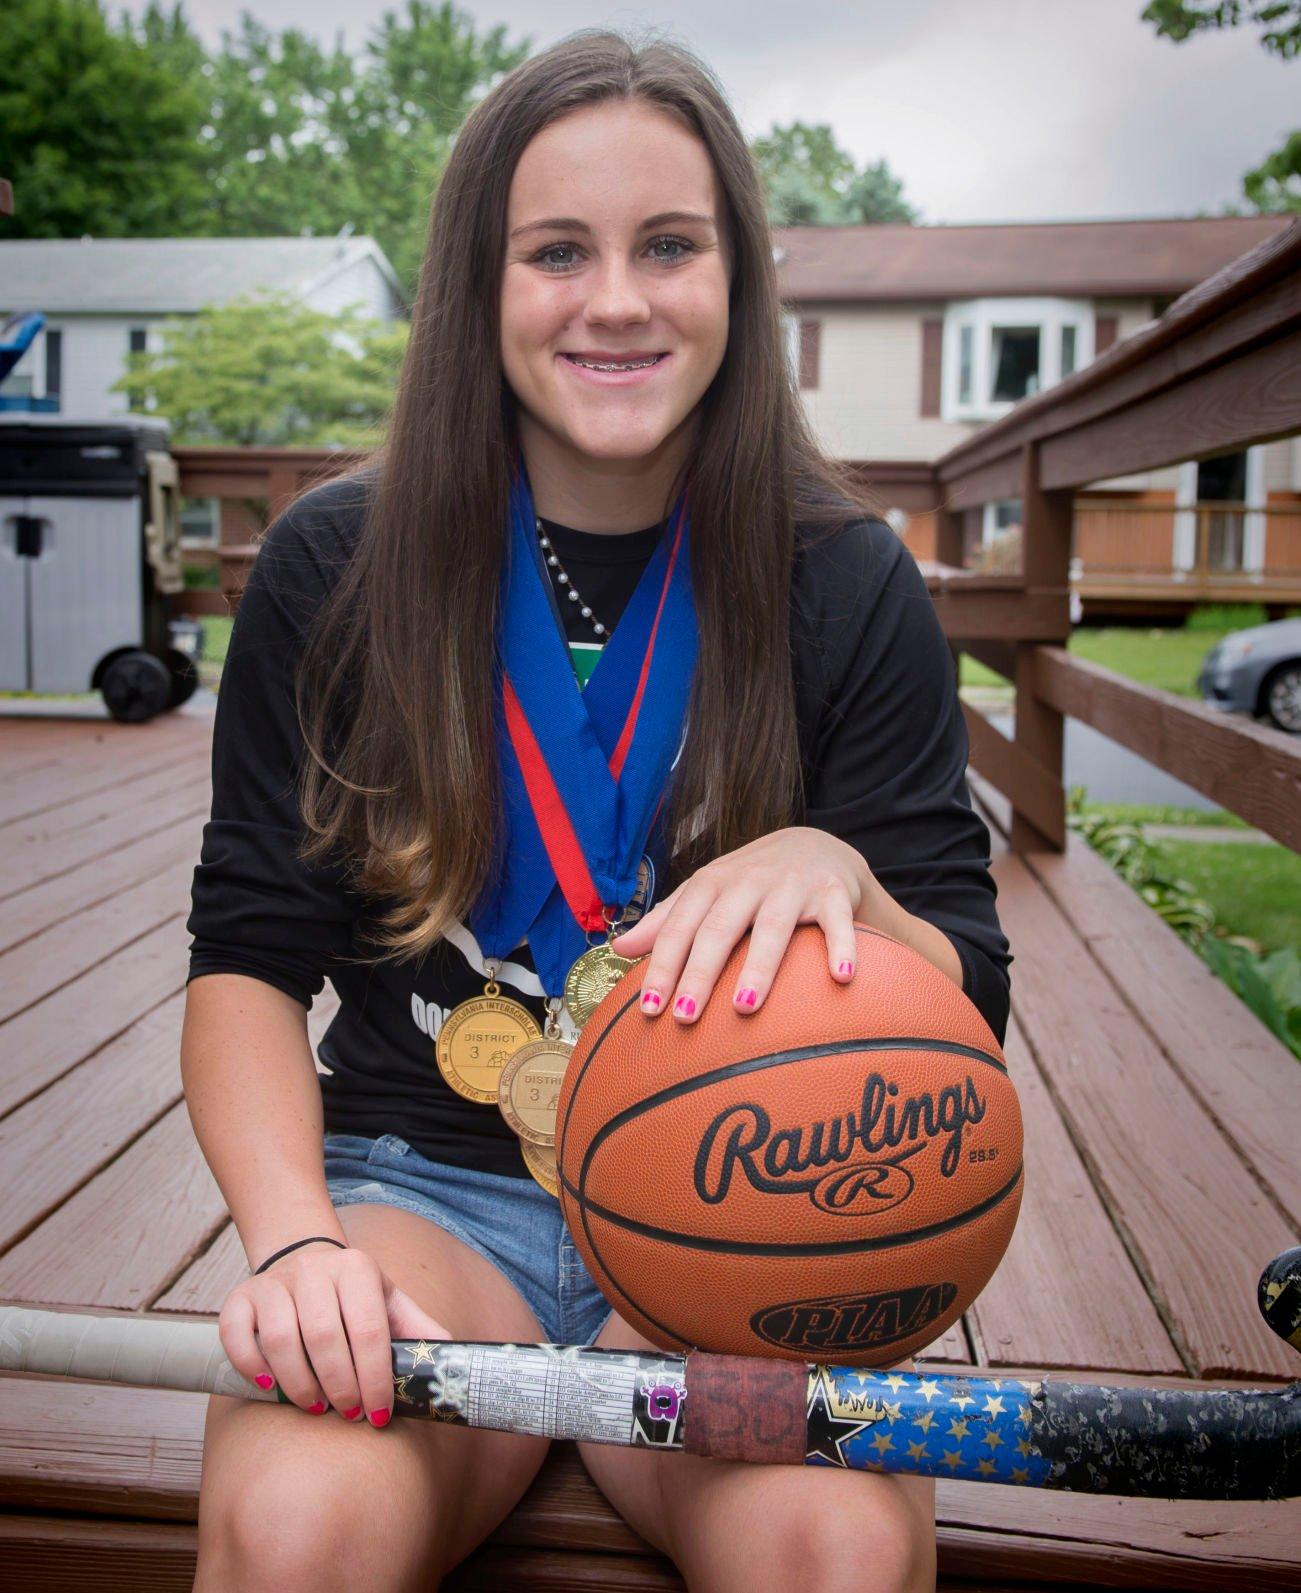 Athlete Kiera Baughman